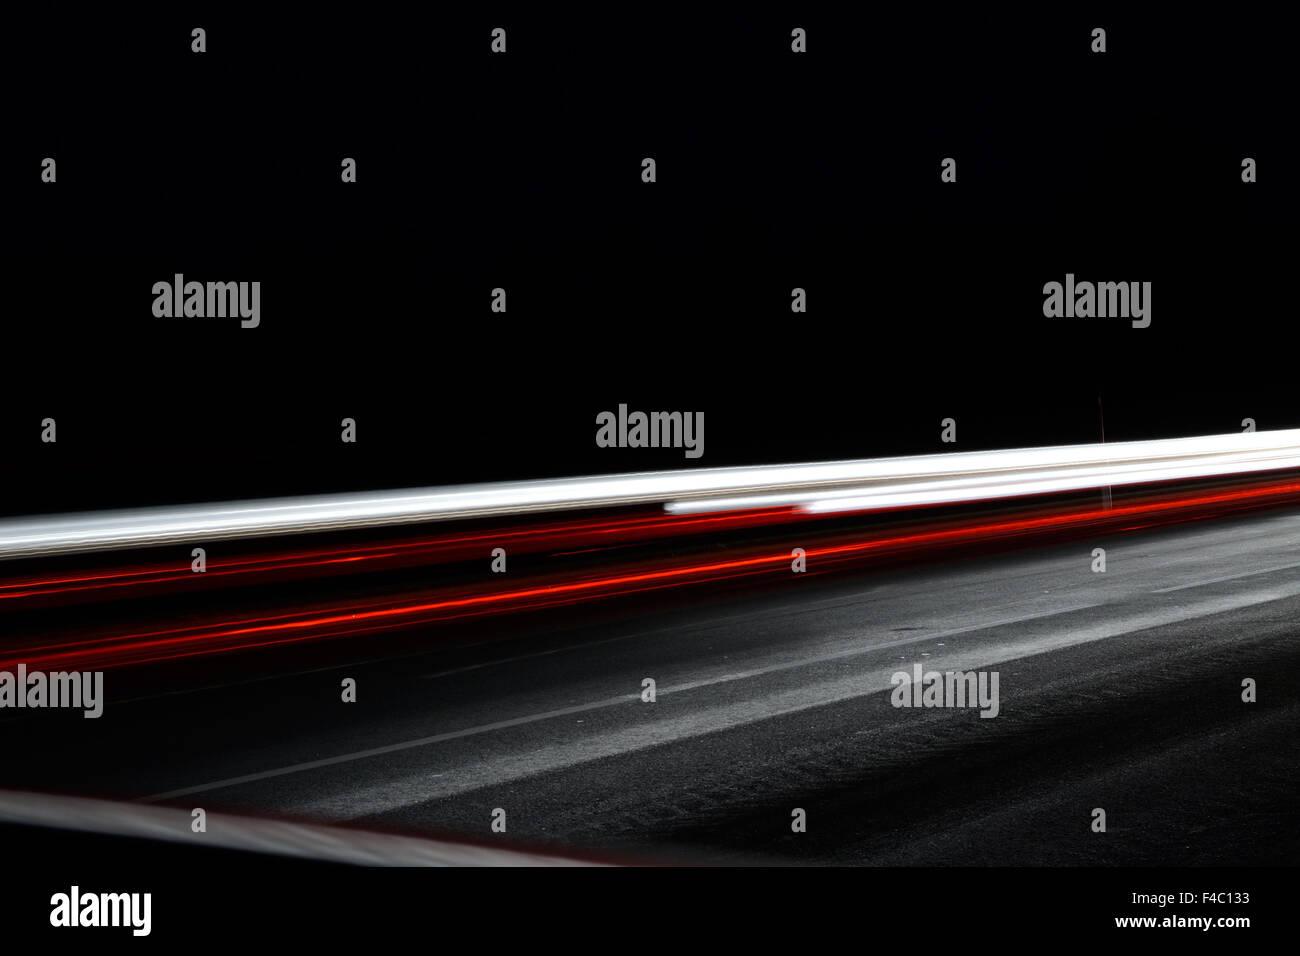 Car In Animation Stock Photos & Car In Animation Stock